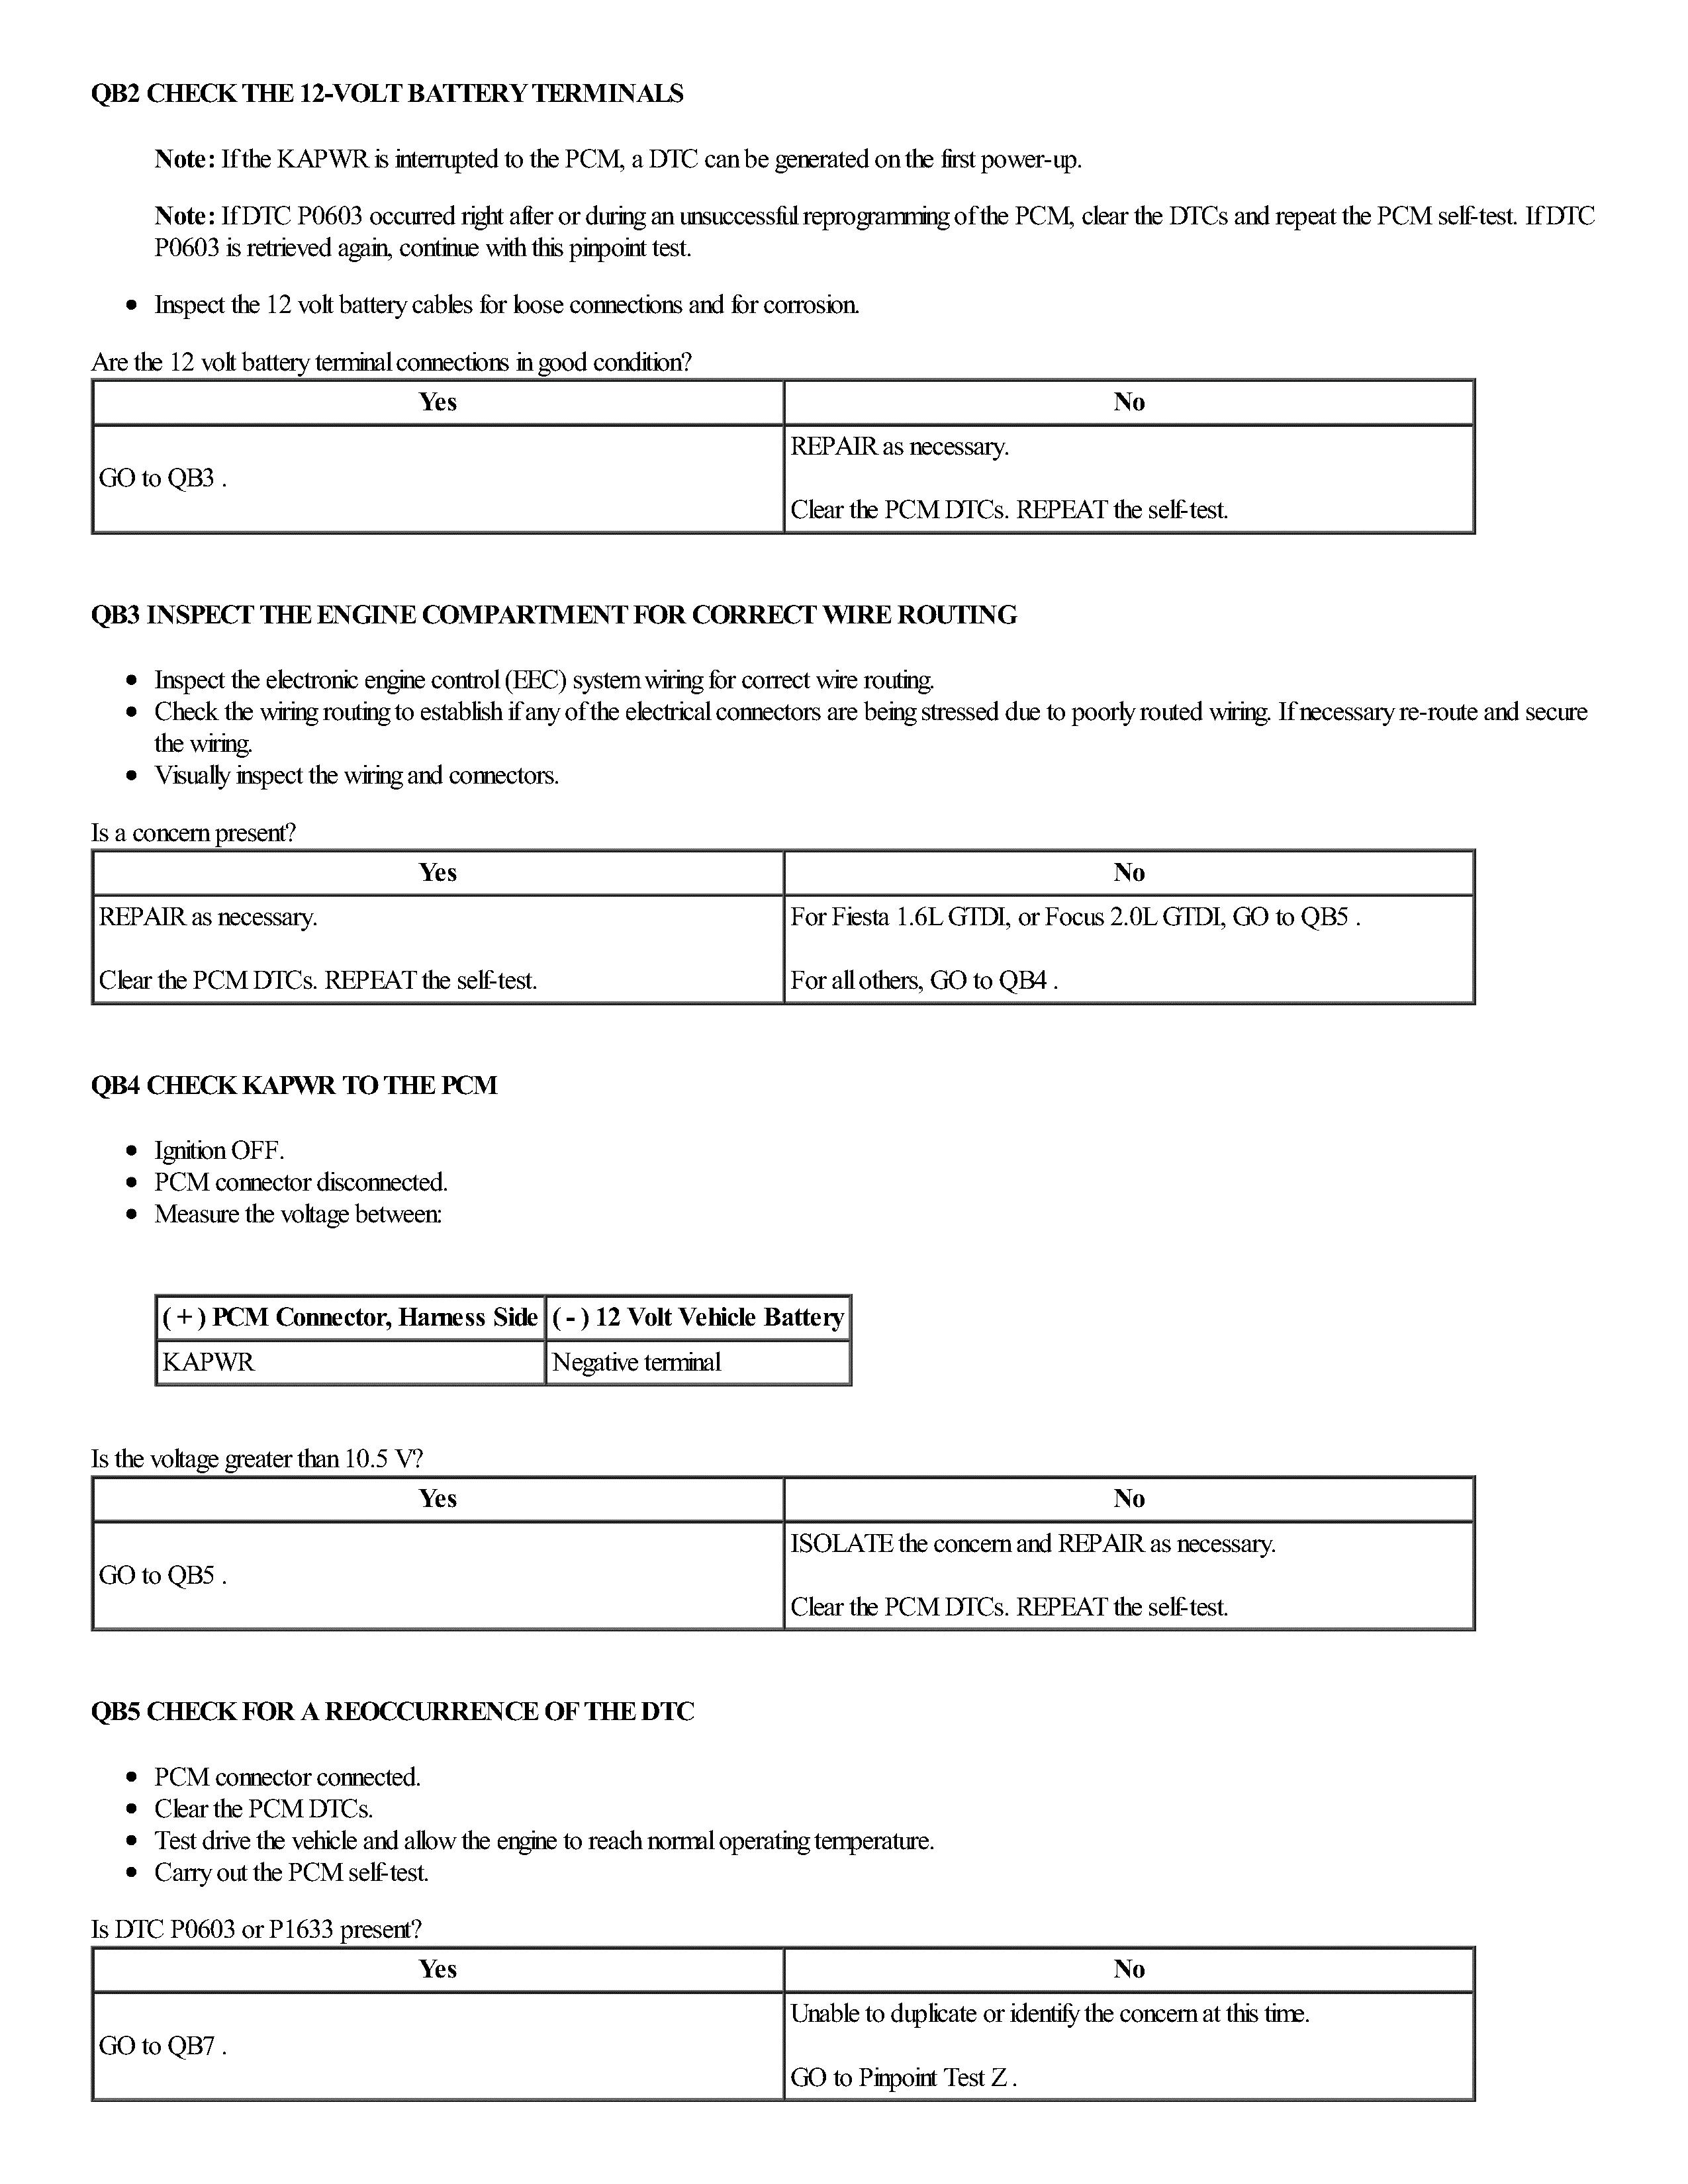 pinpoint-test-qb-2